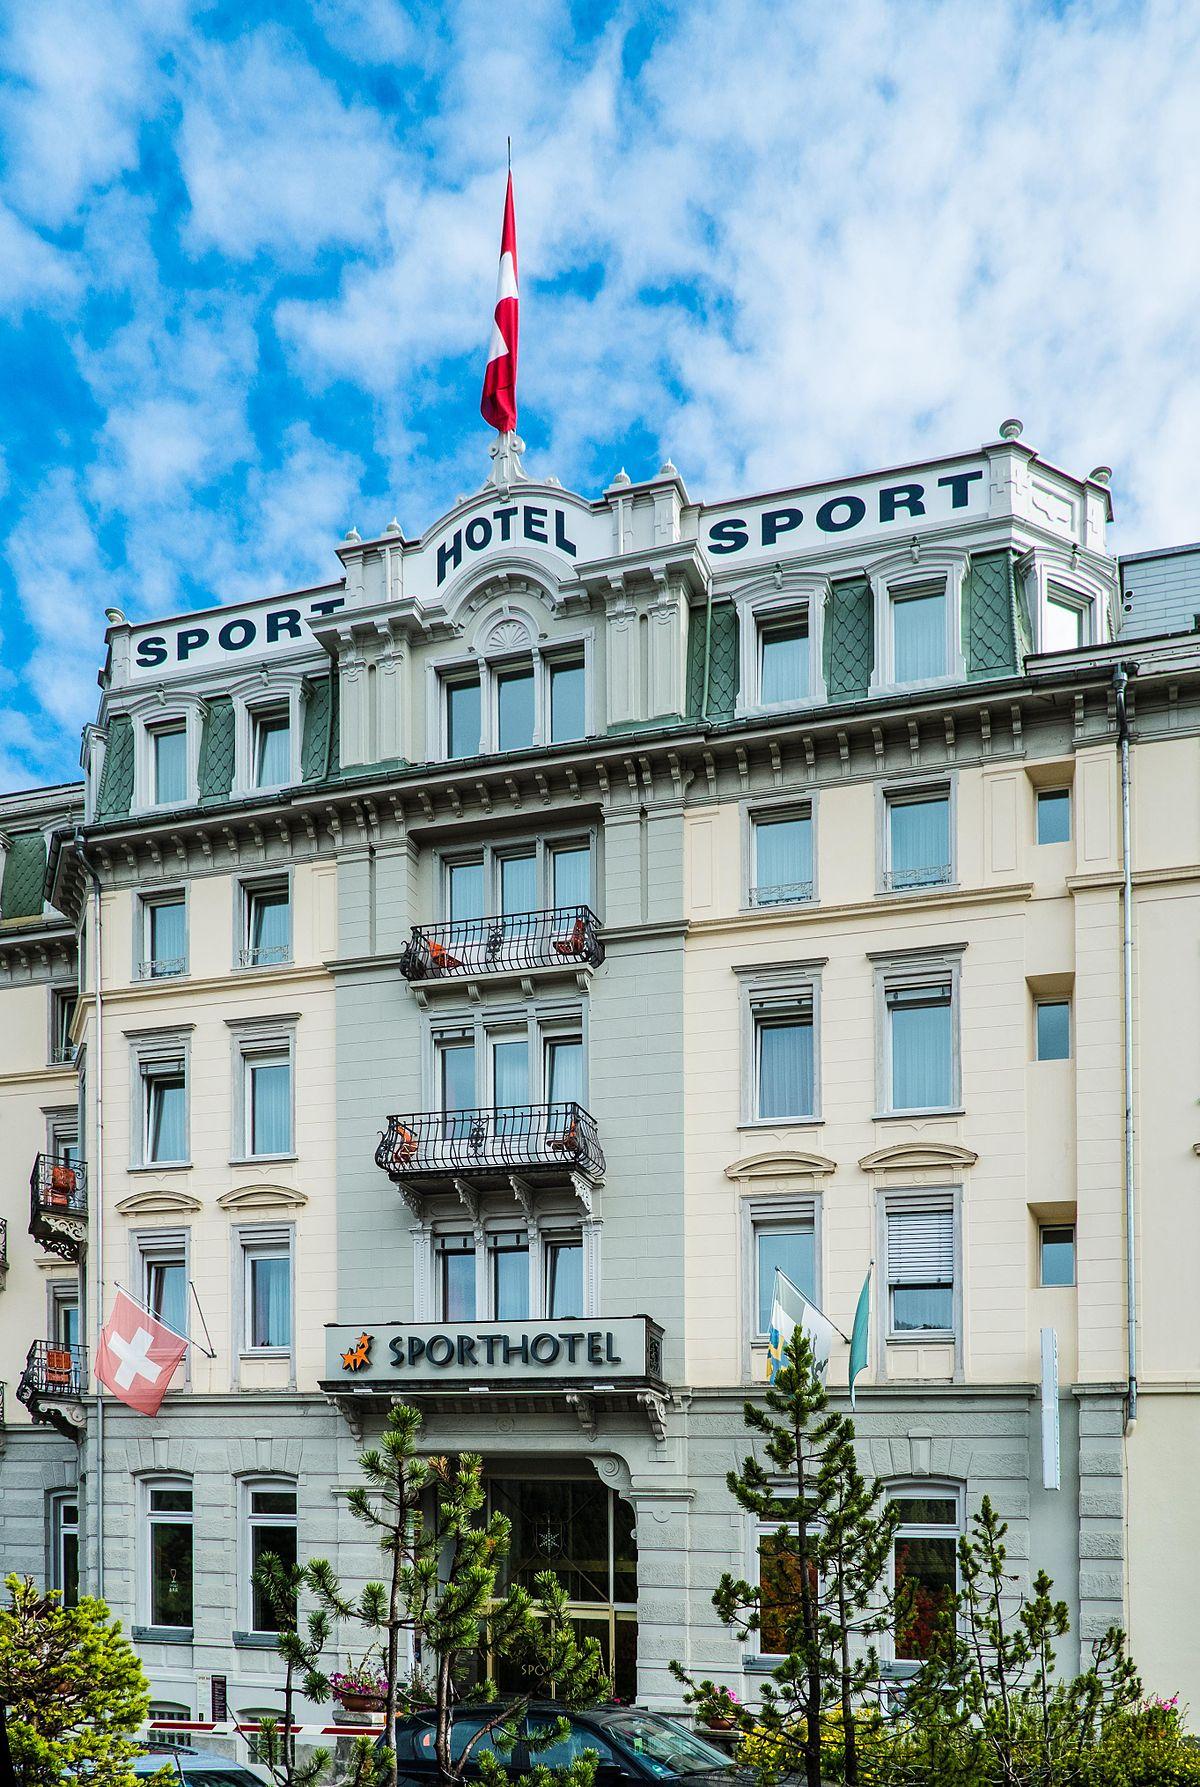 Sporthotel Pontresina – Wikipedia